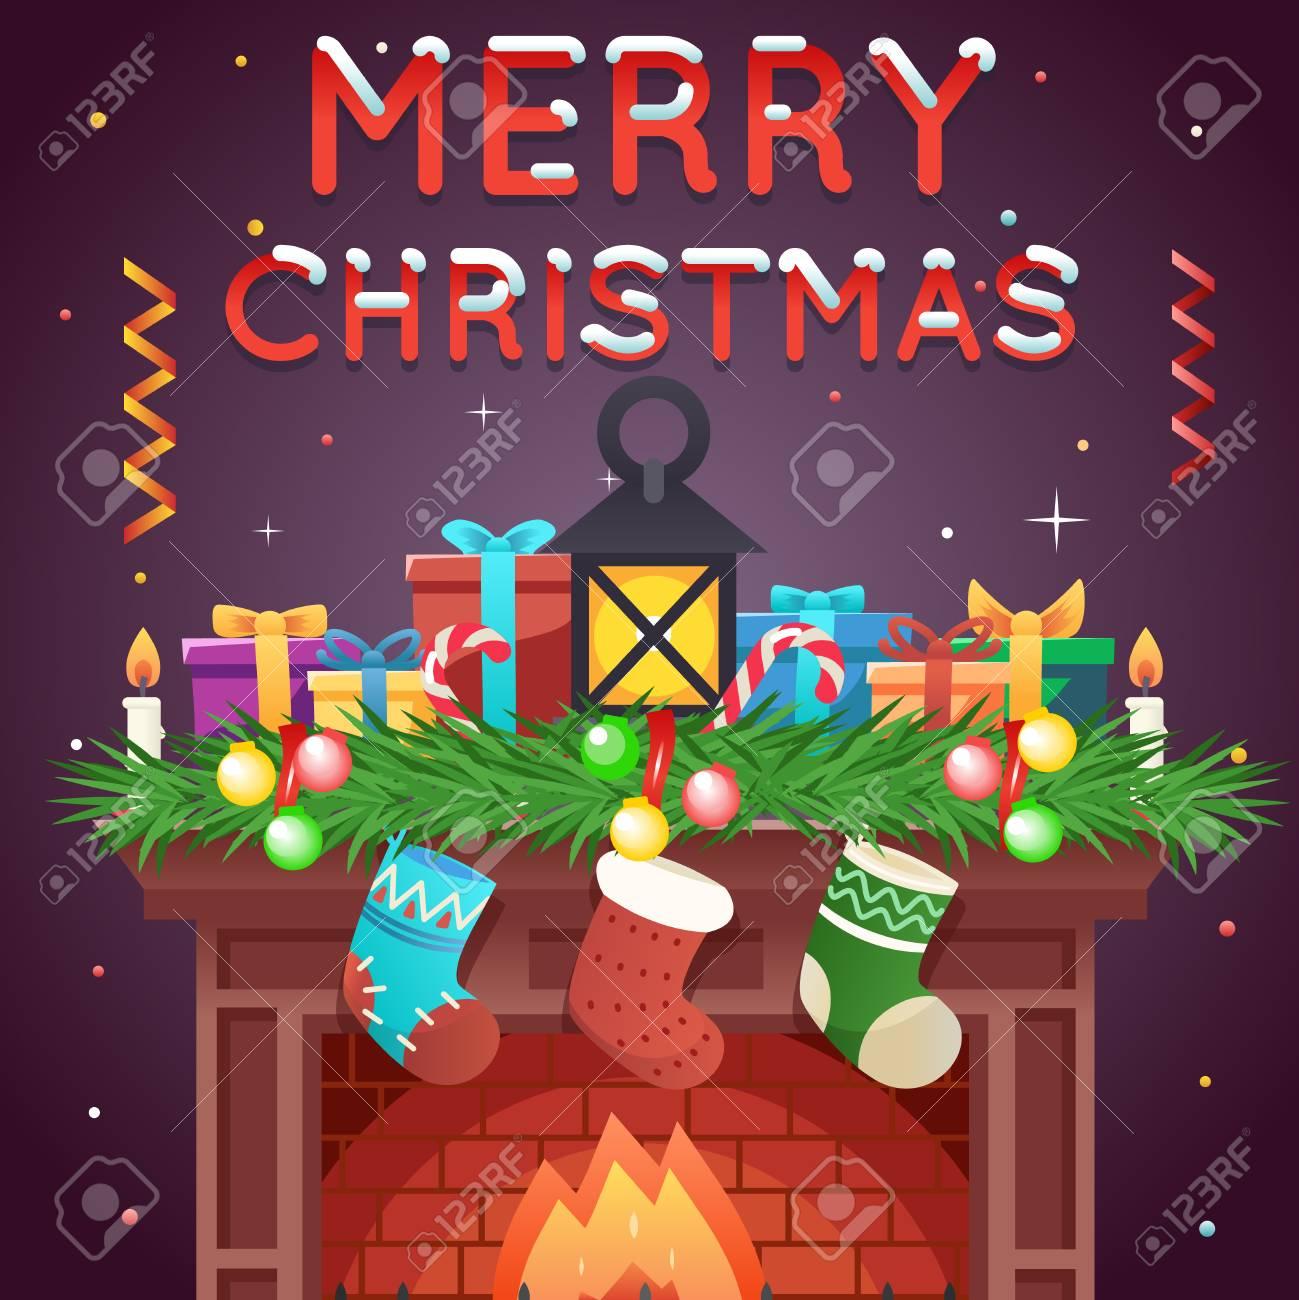 Christmas Celebration Cartoon Images.Fireplace Socks Gifts Candles Template Christmas Celebration